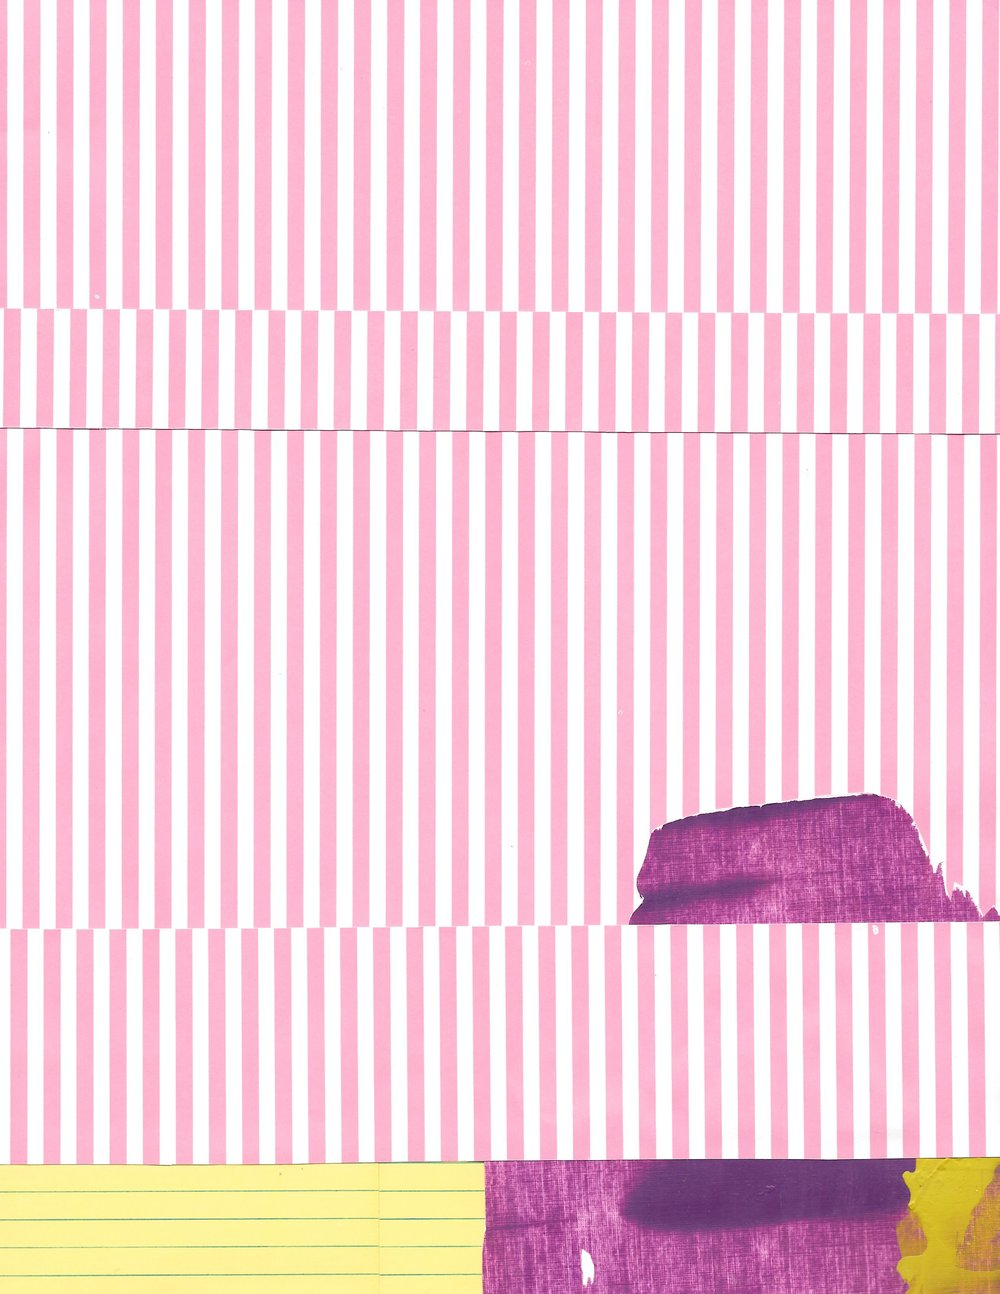 Pink aguacero.jpg